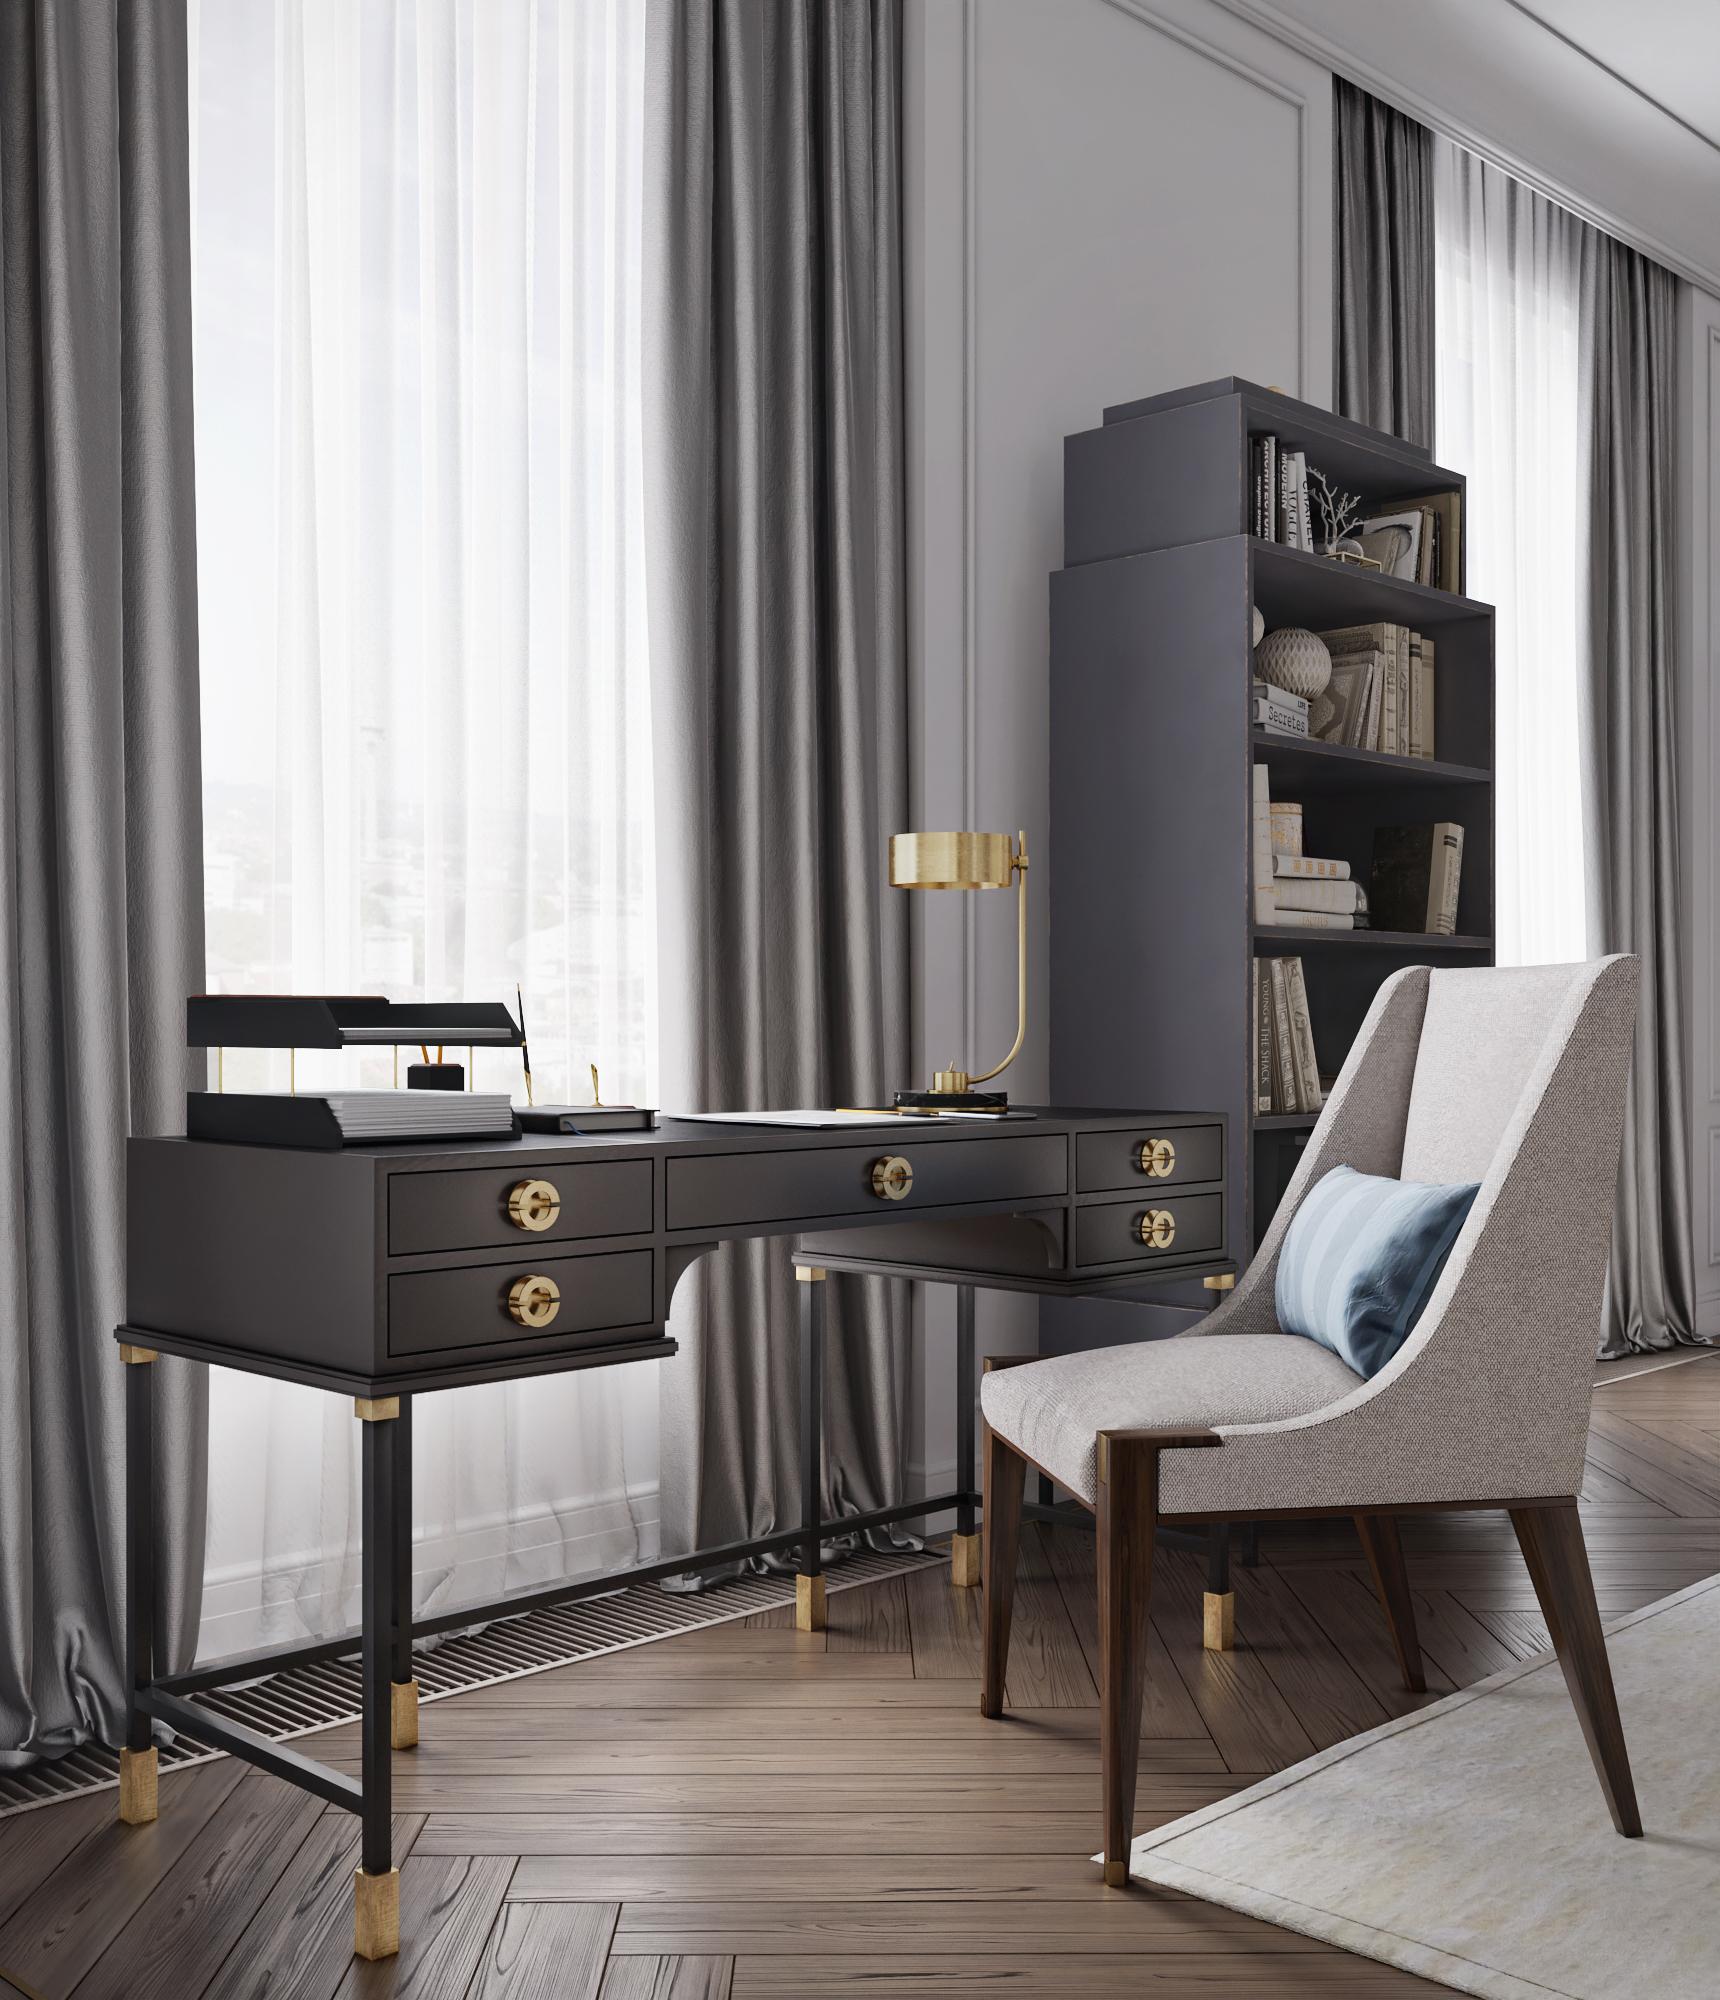 Письменный стол Any-Home P015 -  P015 | AnyHome.ru